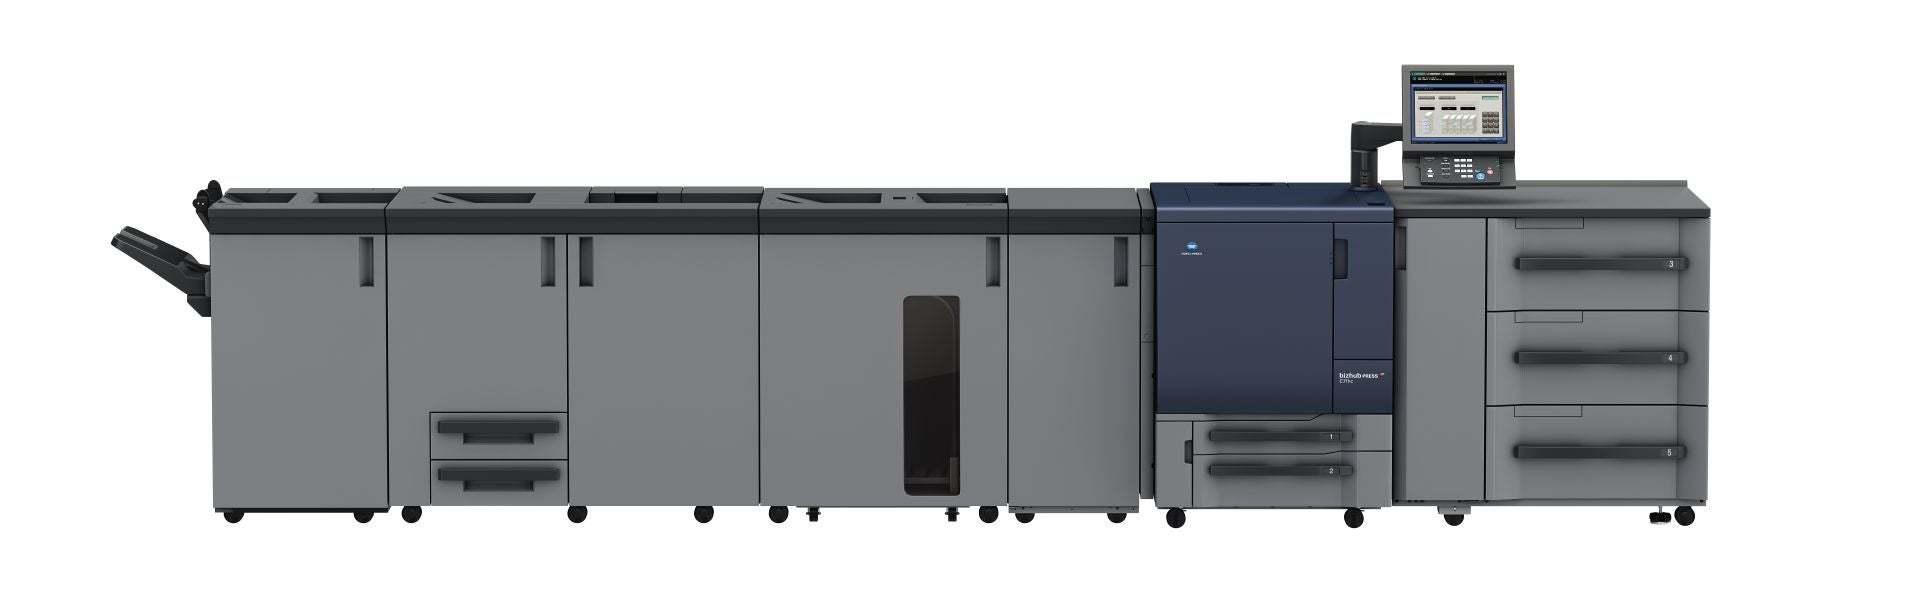 Konica Minolta bizhub pro c71hc professional printer